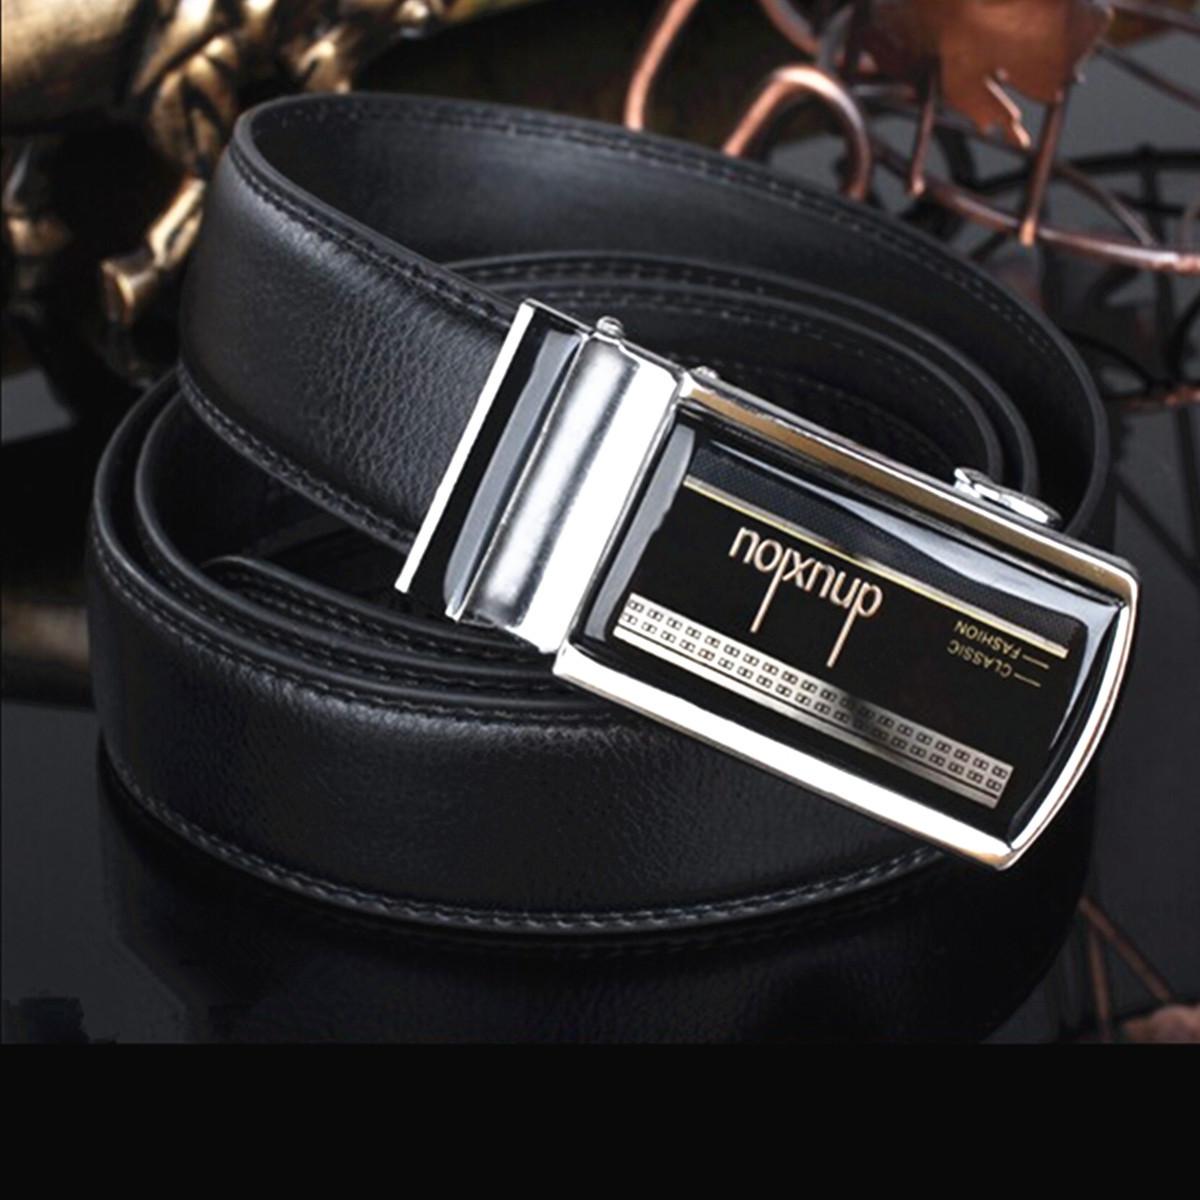 rivenditore online 21c98 87855 Cintura Louis Vuitton Su Ebay itissgv.it